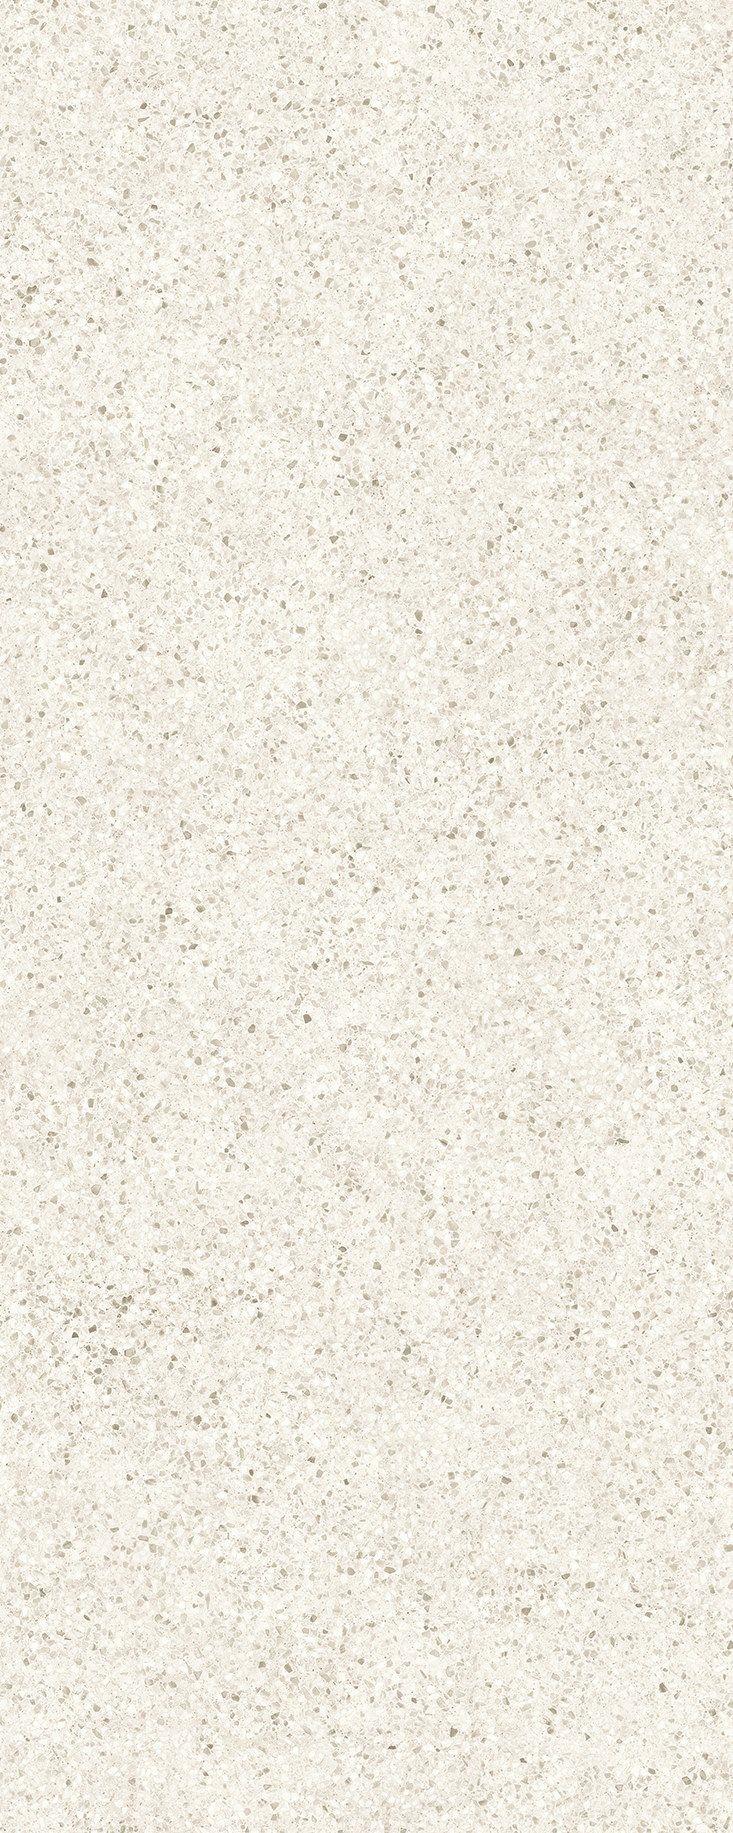 Fluorite Blanco Plus Natural / Natural 100x250 cm